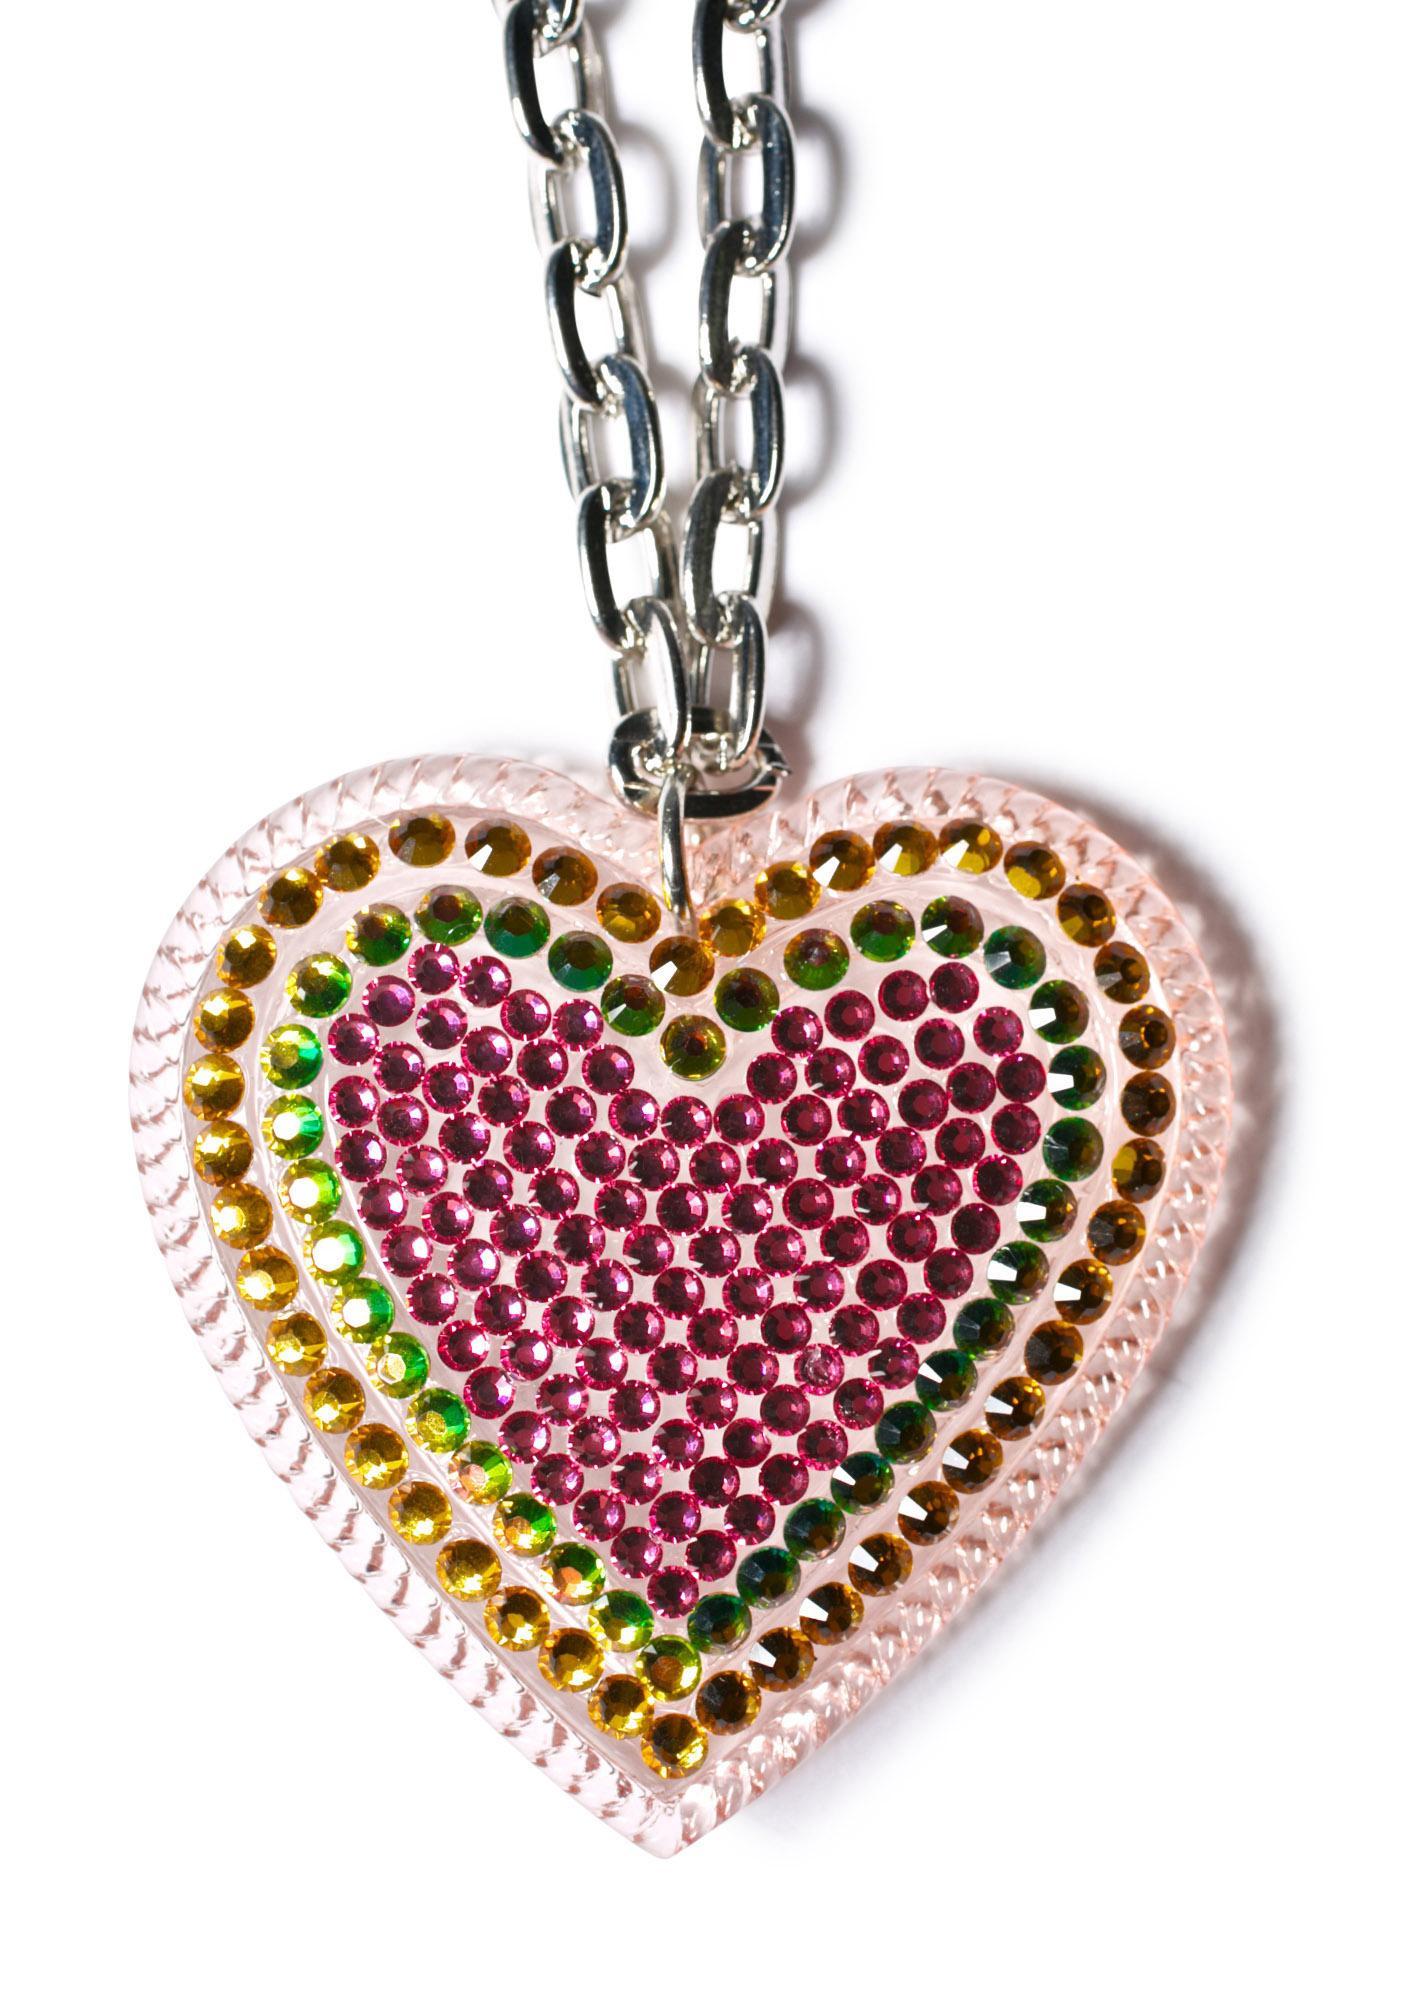 Tarina Tarantino Parlour Heart Pendant Necklace